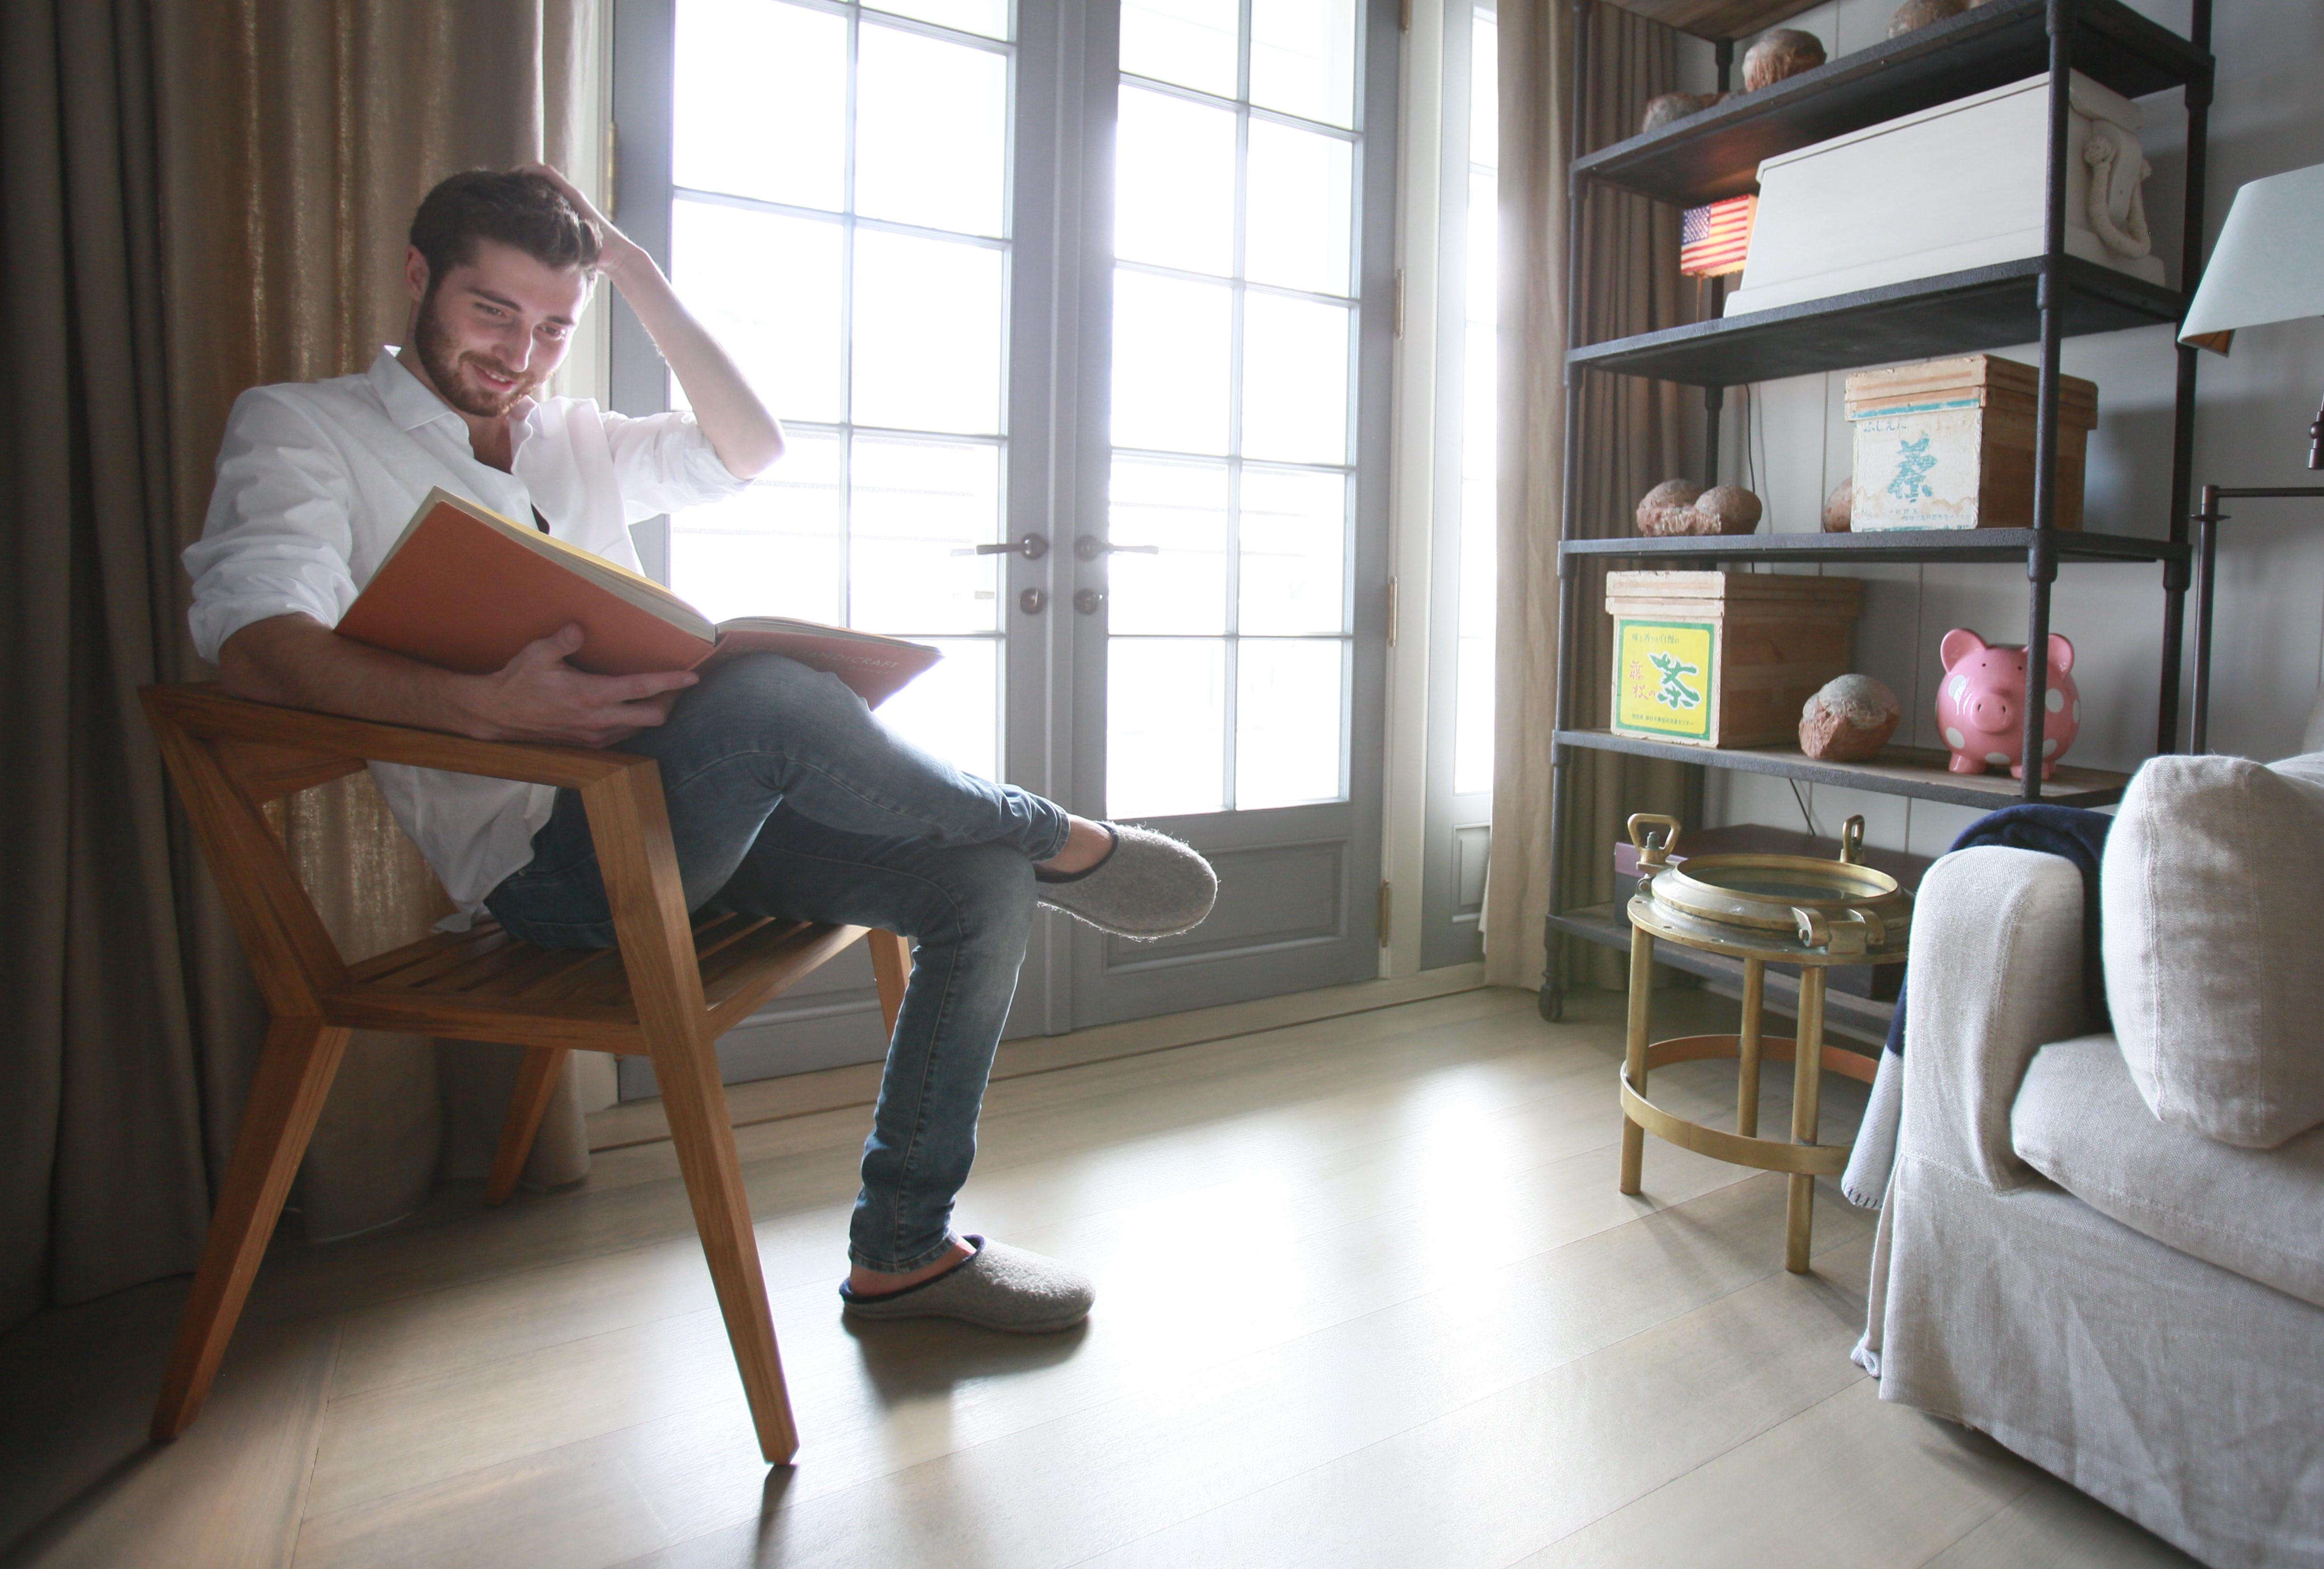 New Kdhamptons Featured Designer Custom Furniture Craftsman Maximilian Eicke Kdhamptons